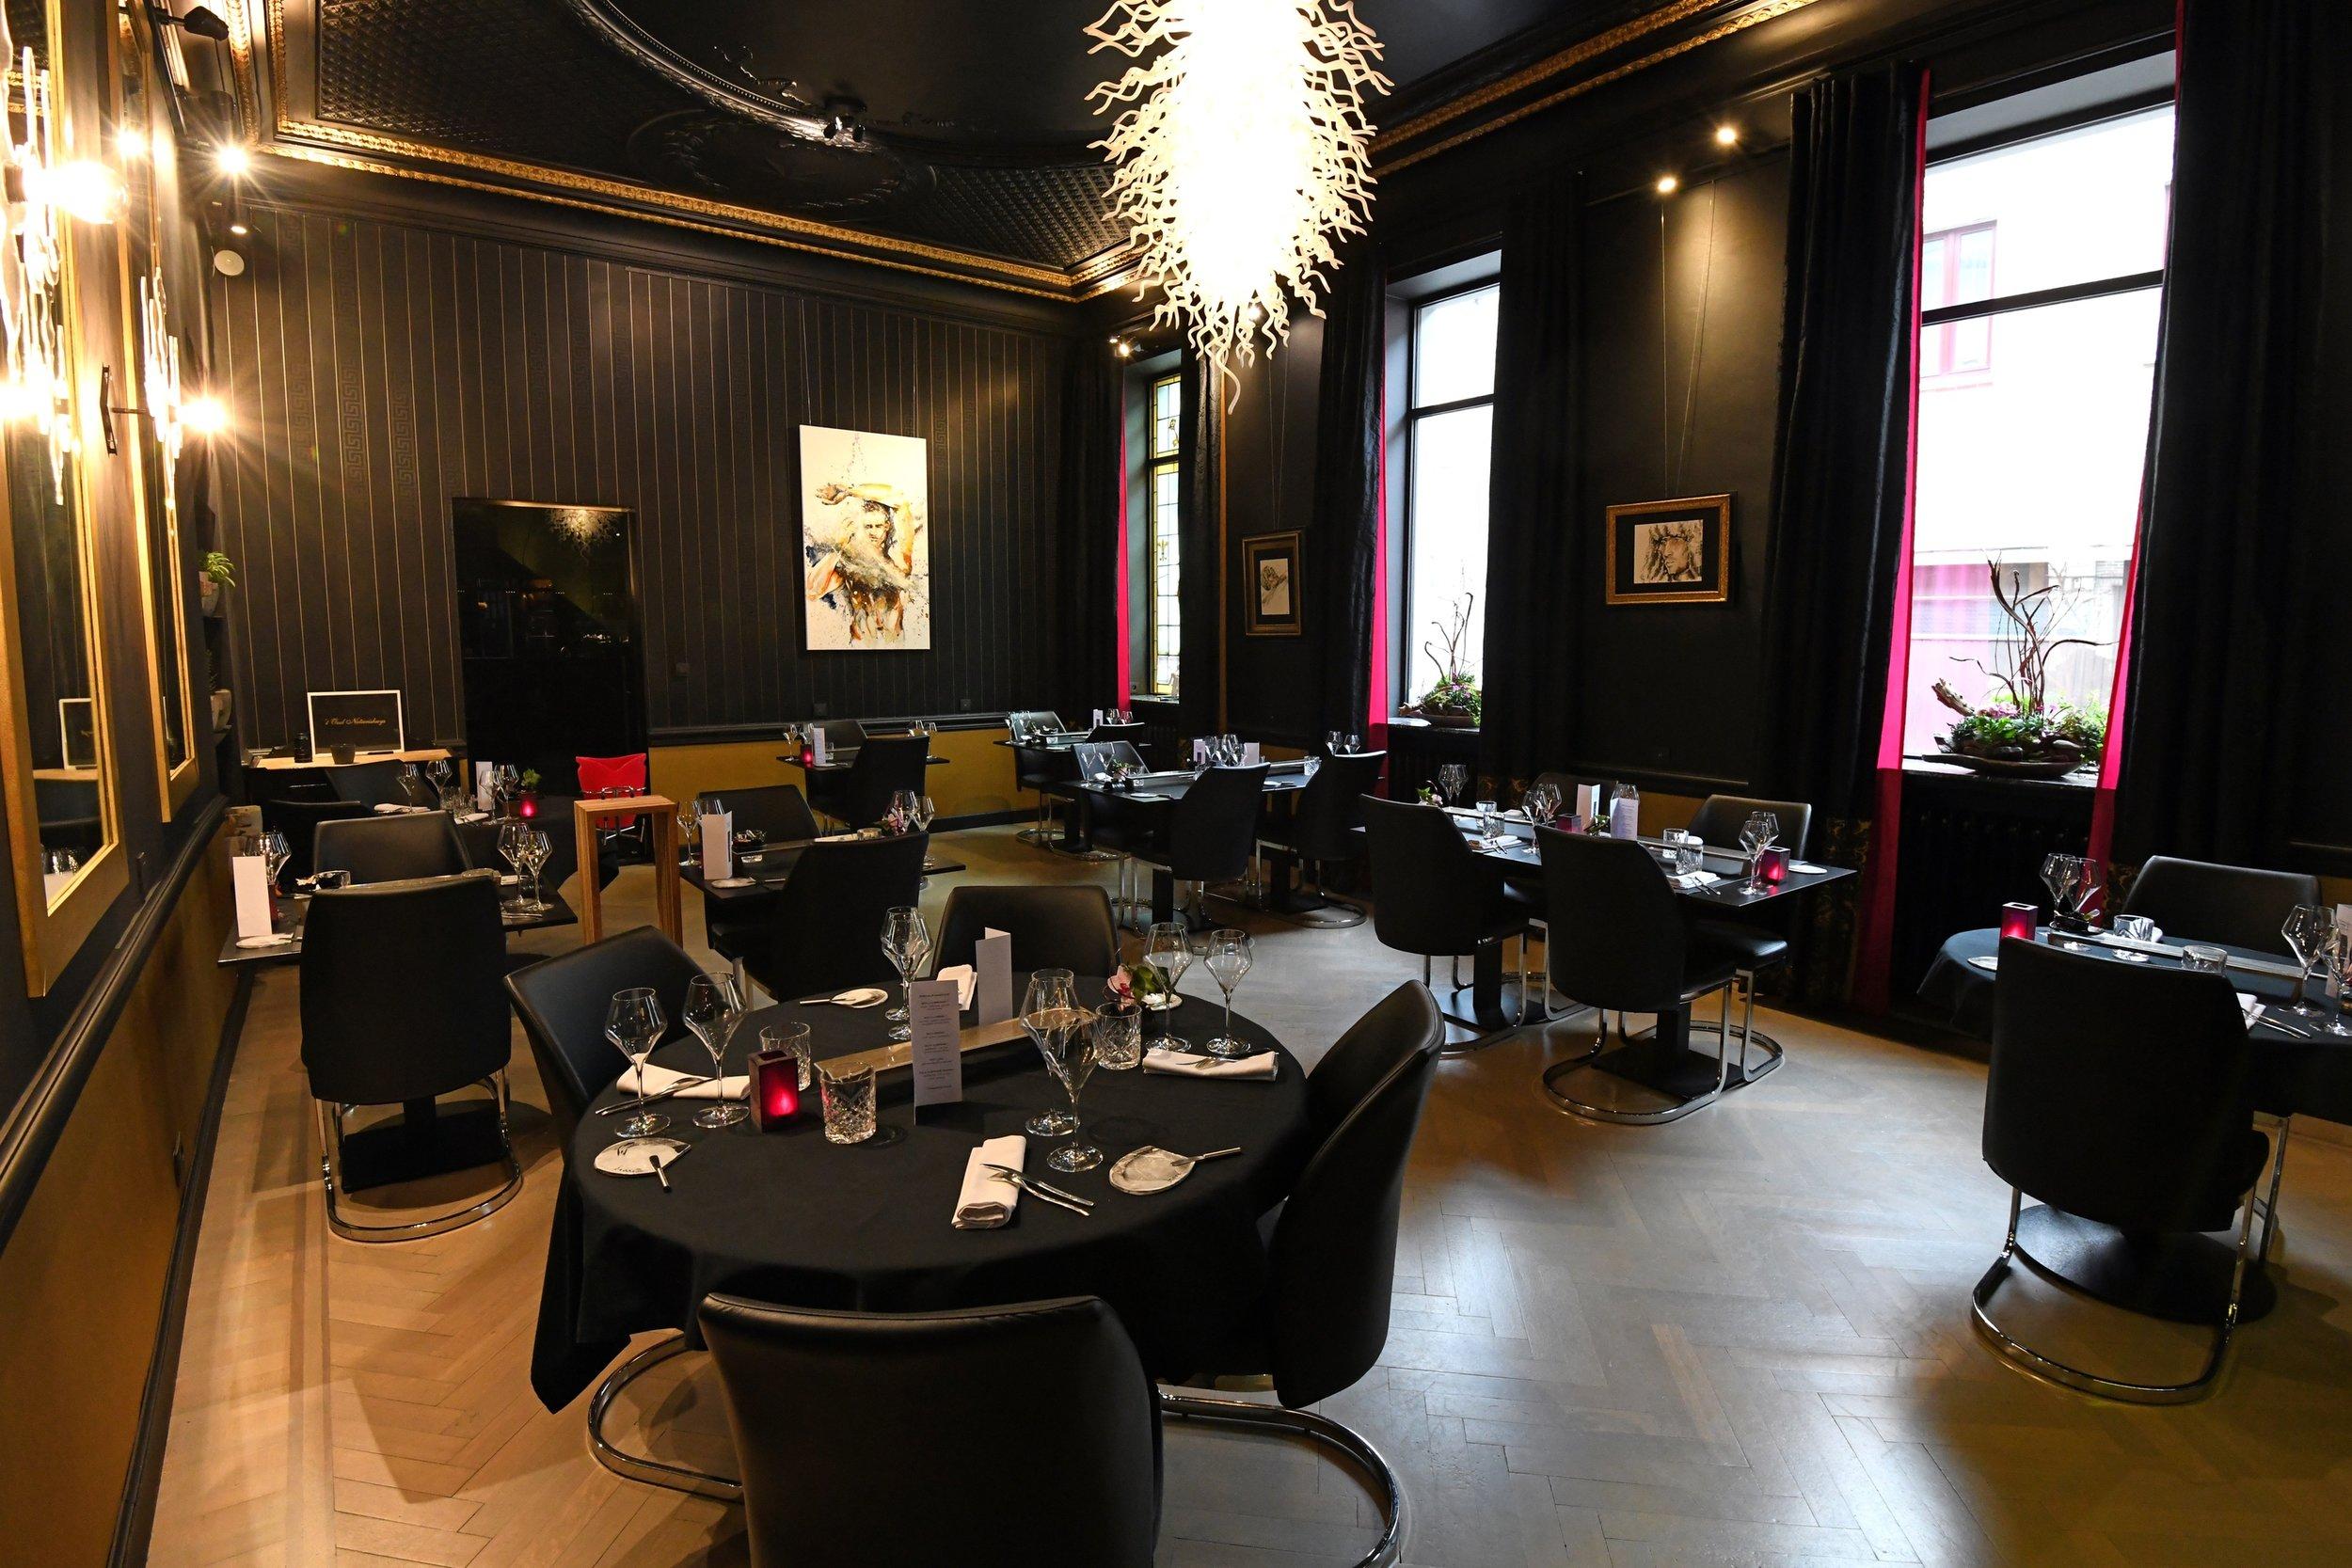 3 restaurant brasserie oud notarishuis ninove bart albrecht tablefever .jpg